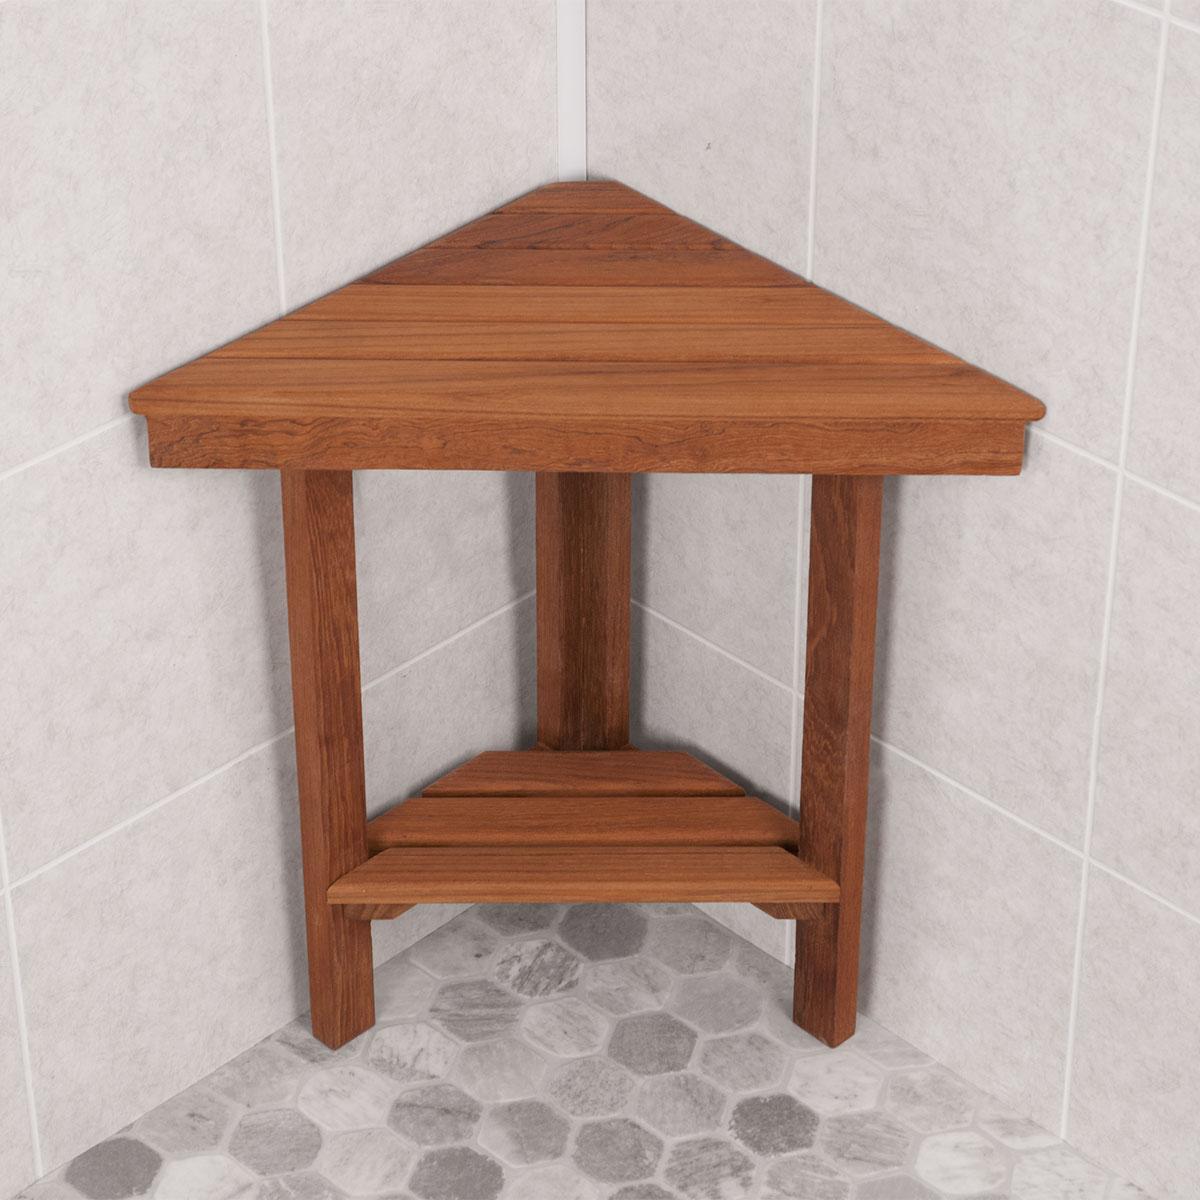 Shower Corner Shelves Decor Ideasdecor Ideas